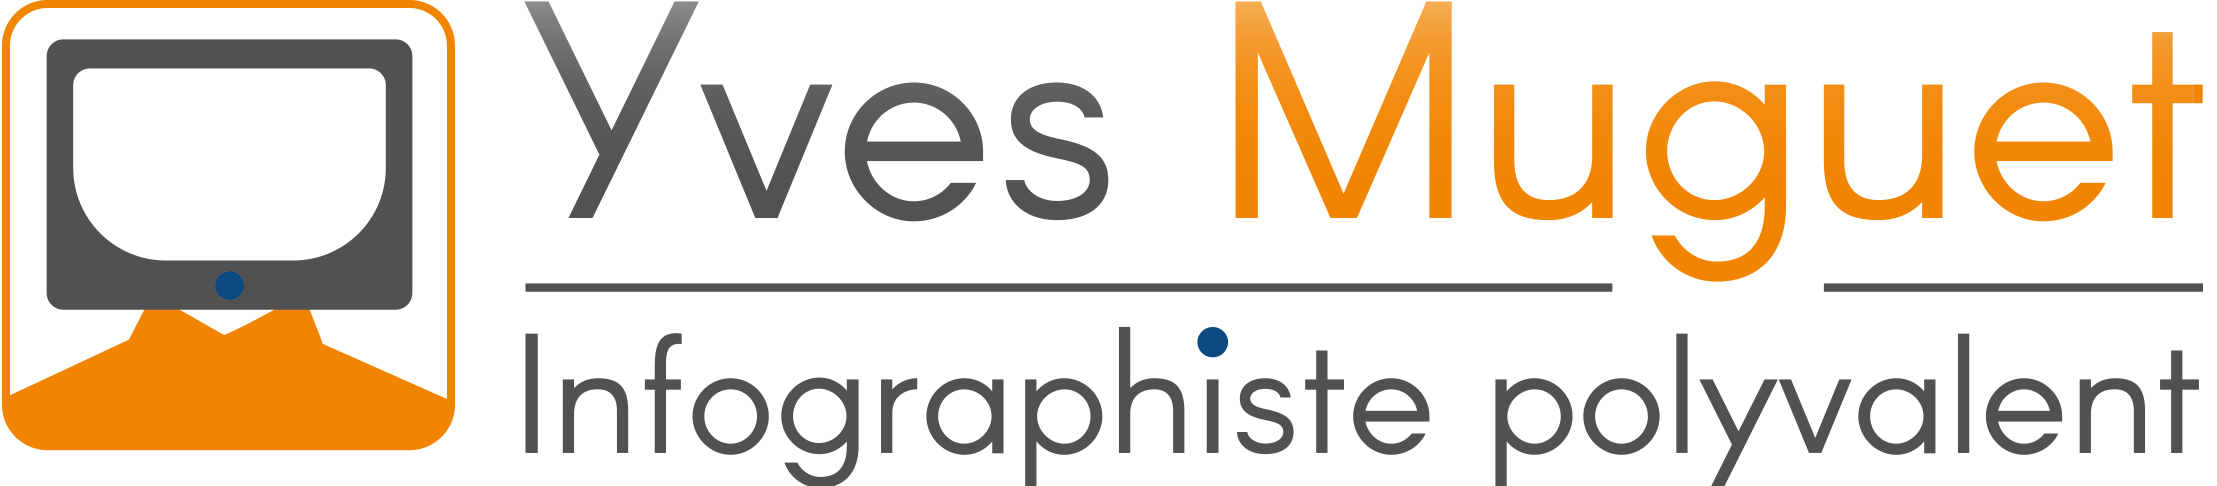 infographiste print et web